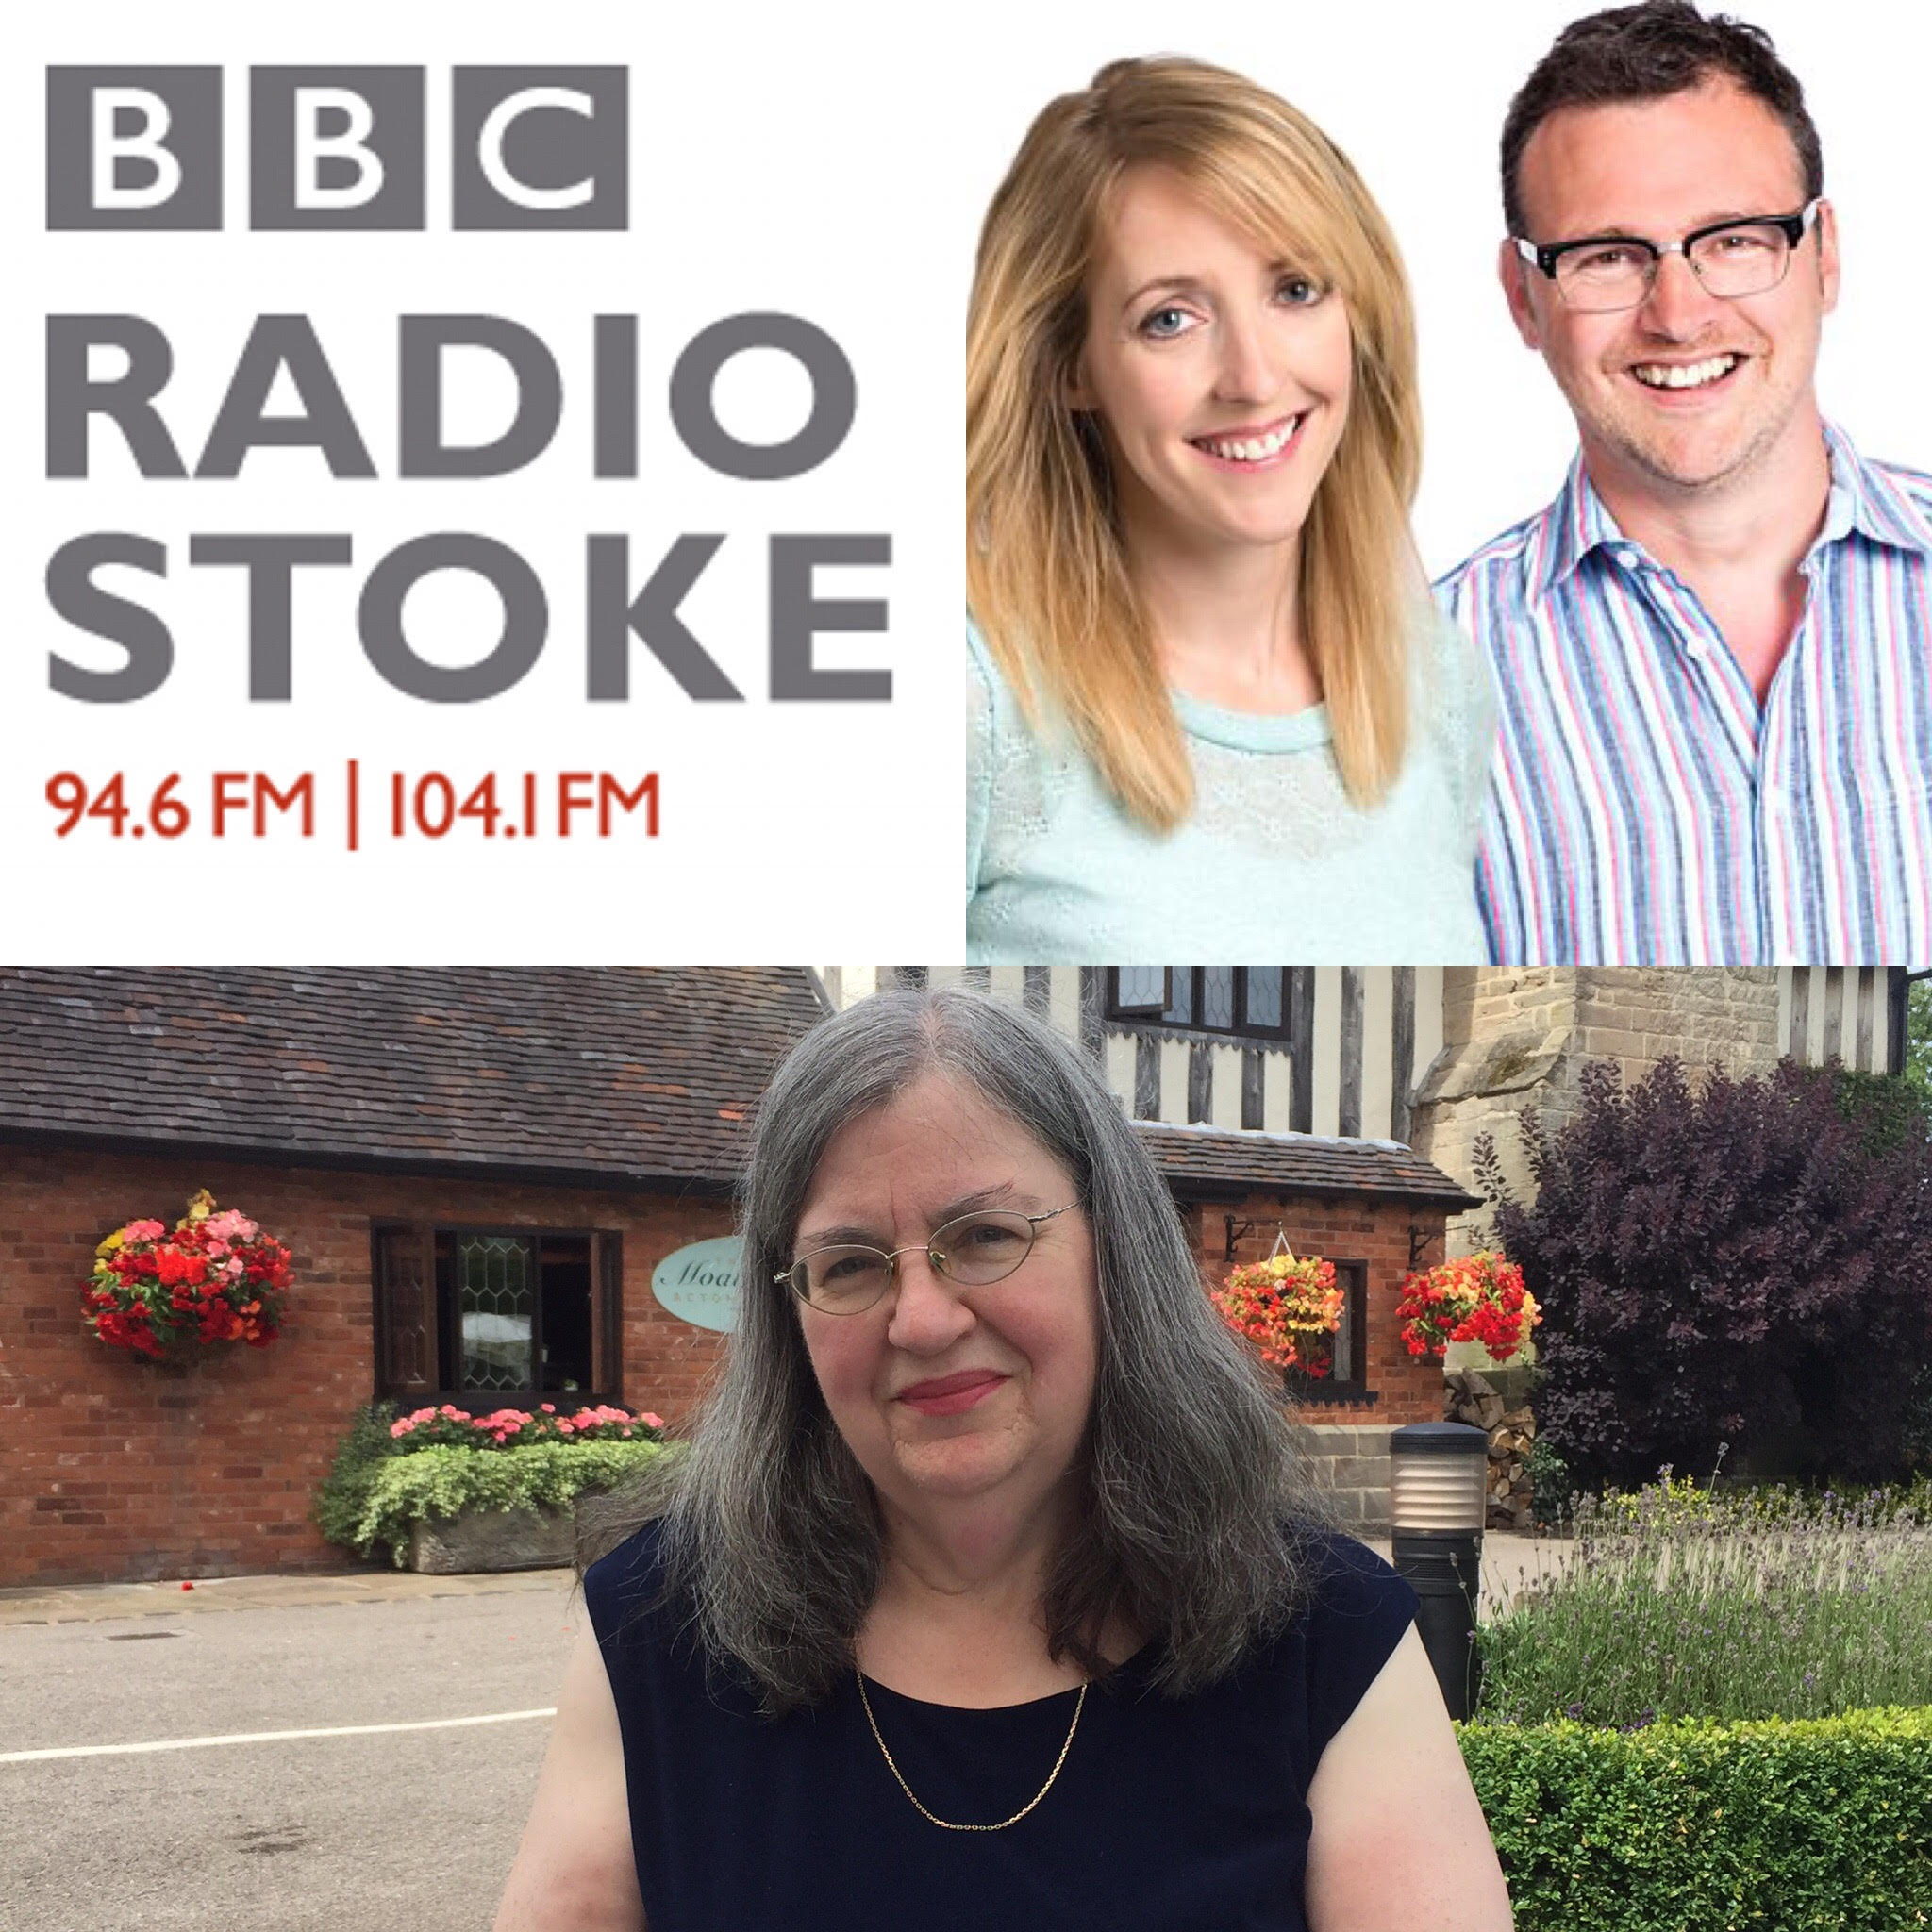 montag_bbcradiostoke